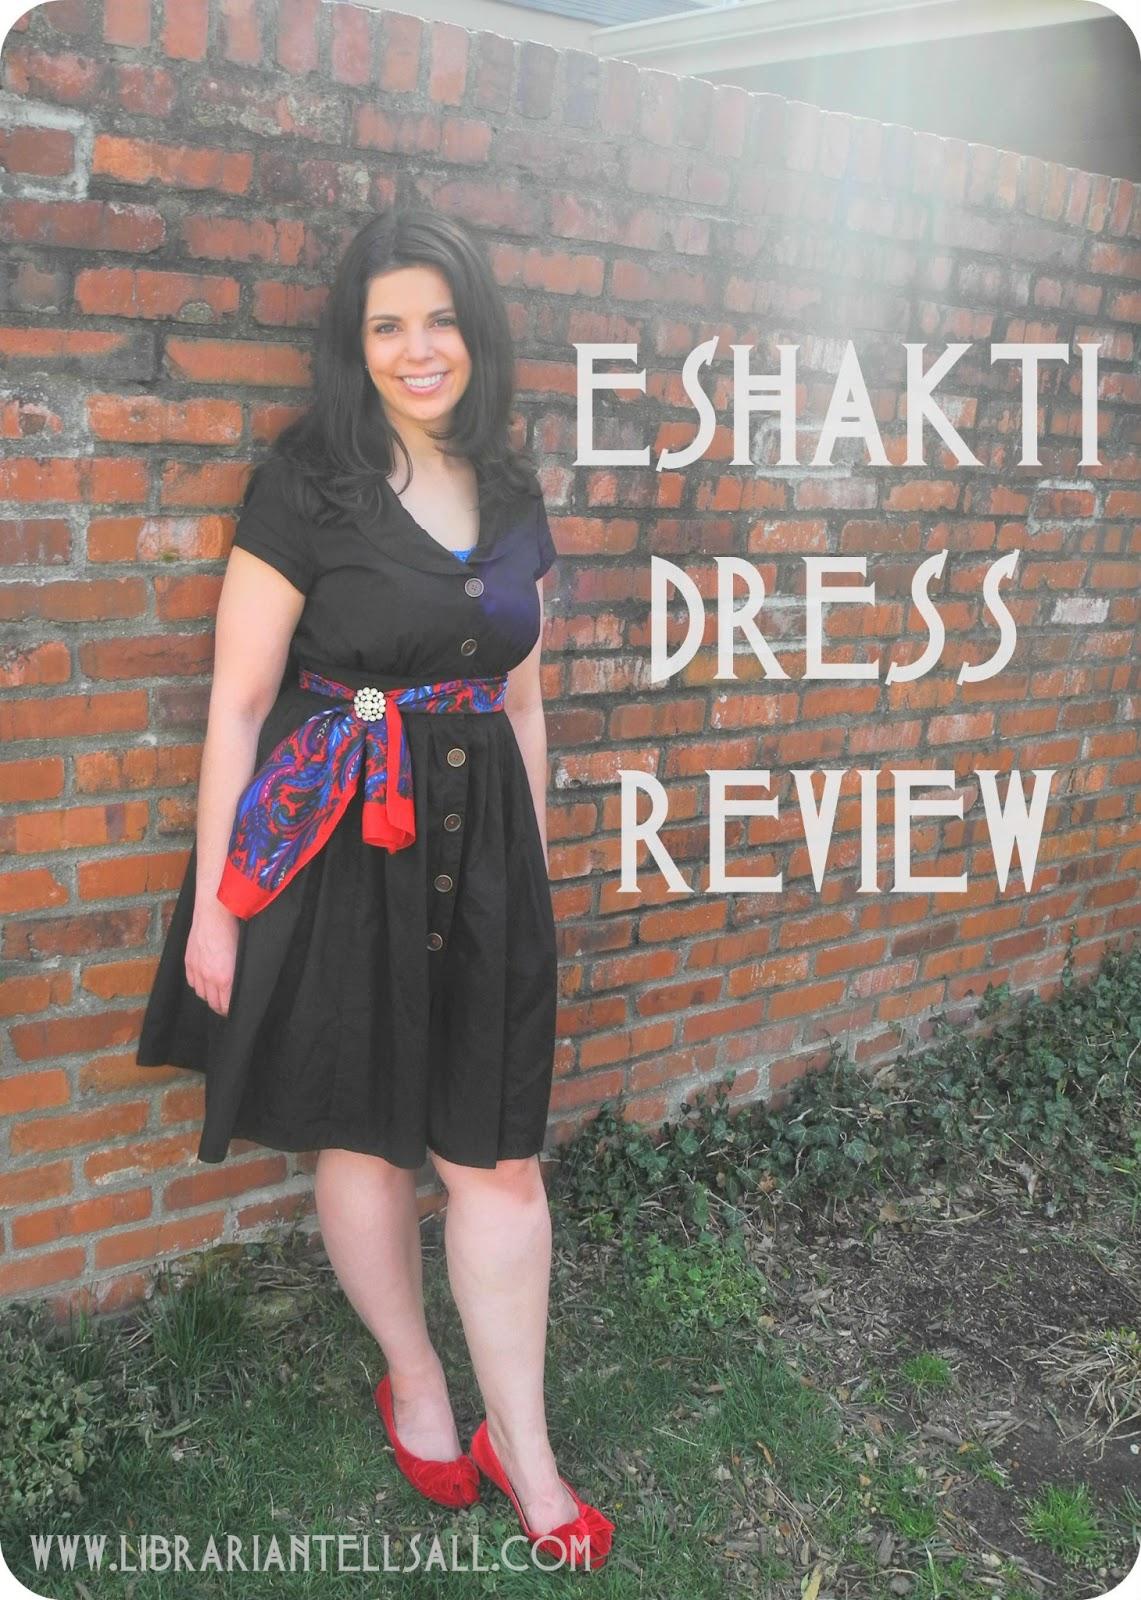 Librarian tells all eshakti dresses bespoke frocks are made of awesome eshakti dresses bespoke frocks are made of awesome ombrellifo Choice Image